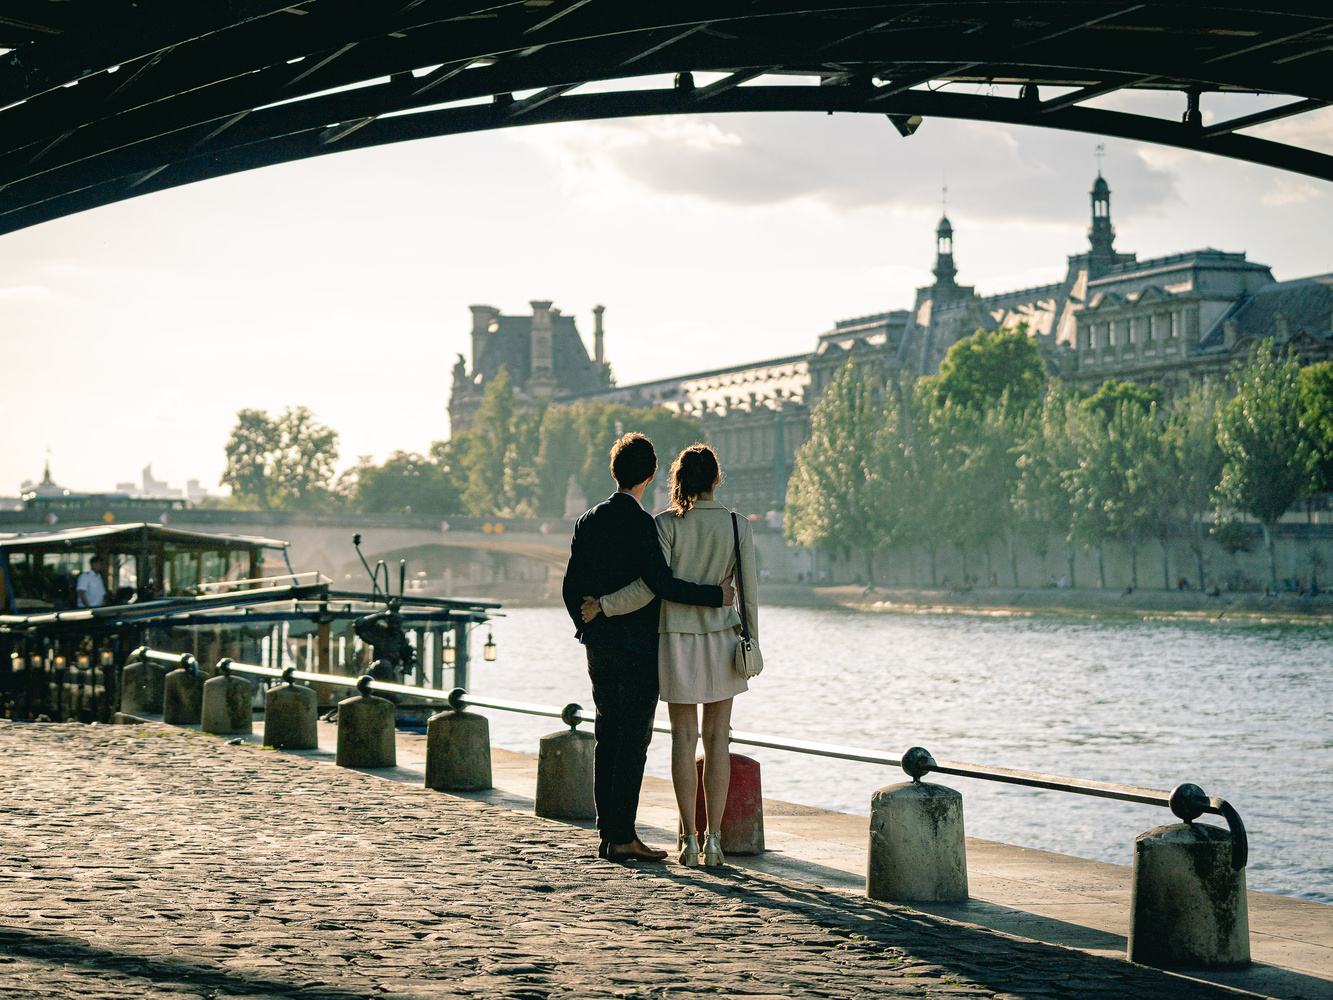 Lovers under the bridge by Sebastien Sepheriades